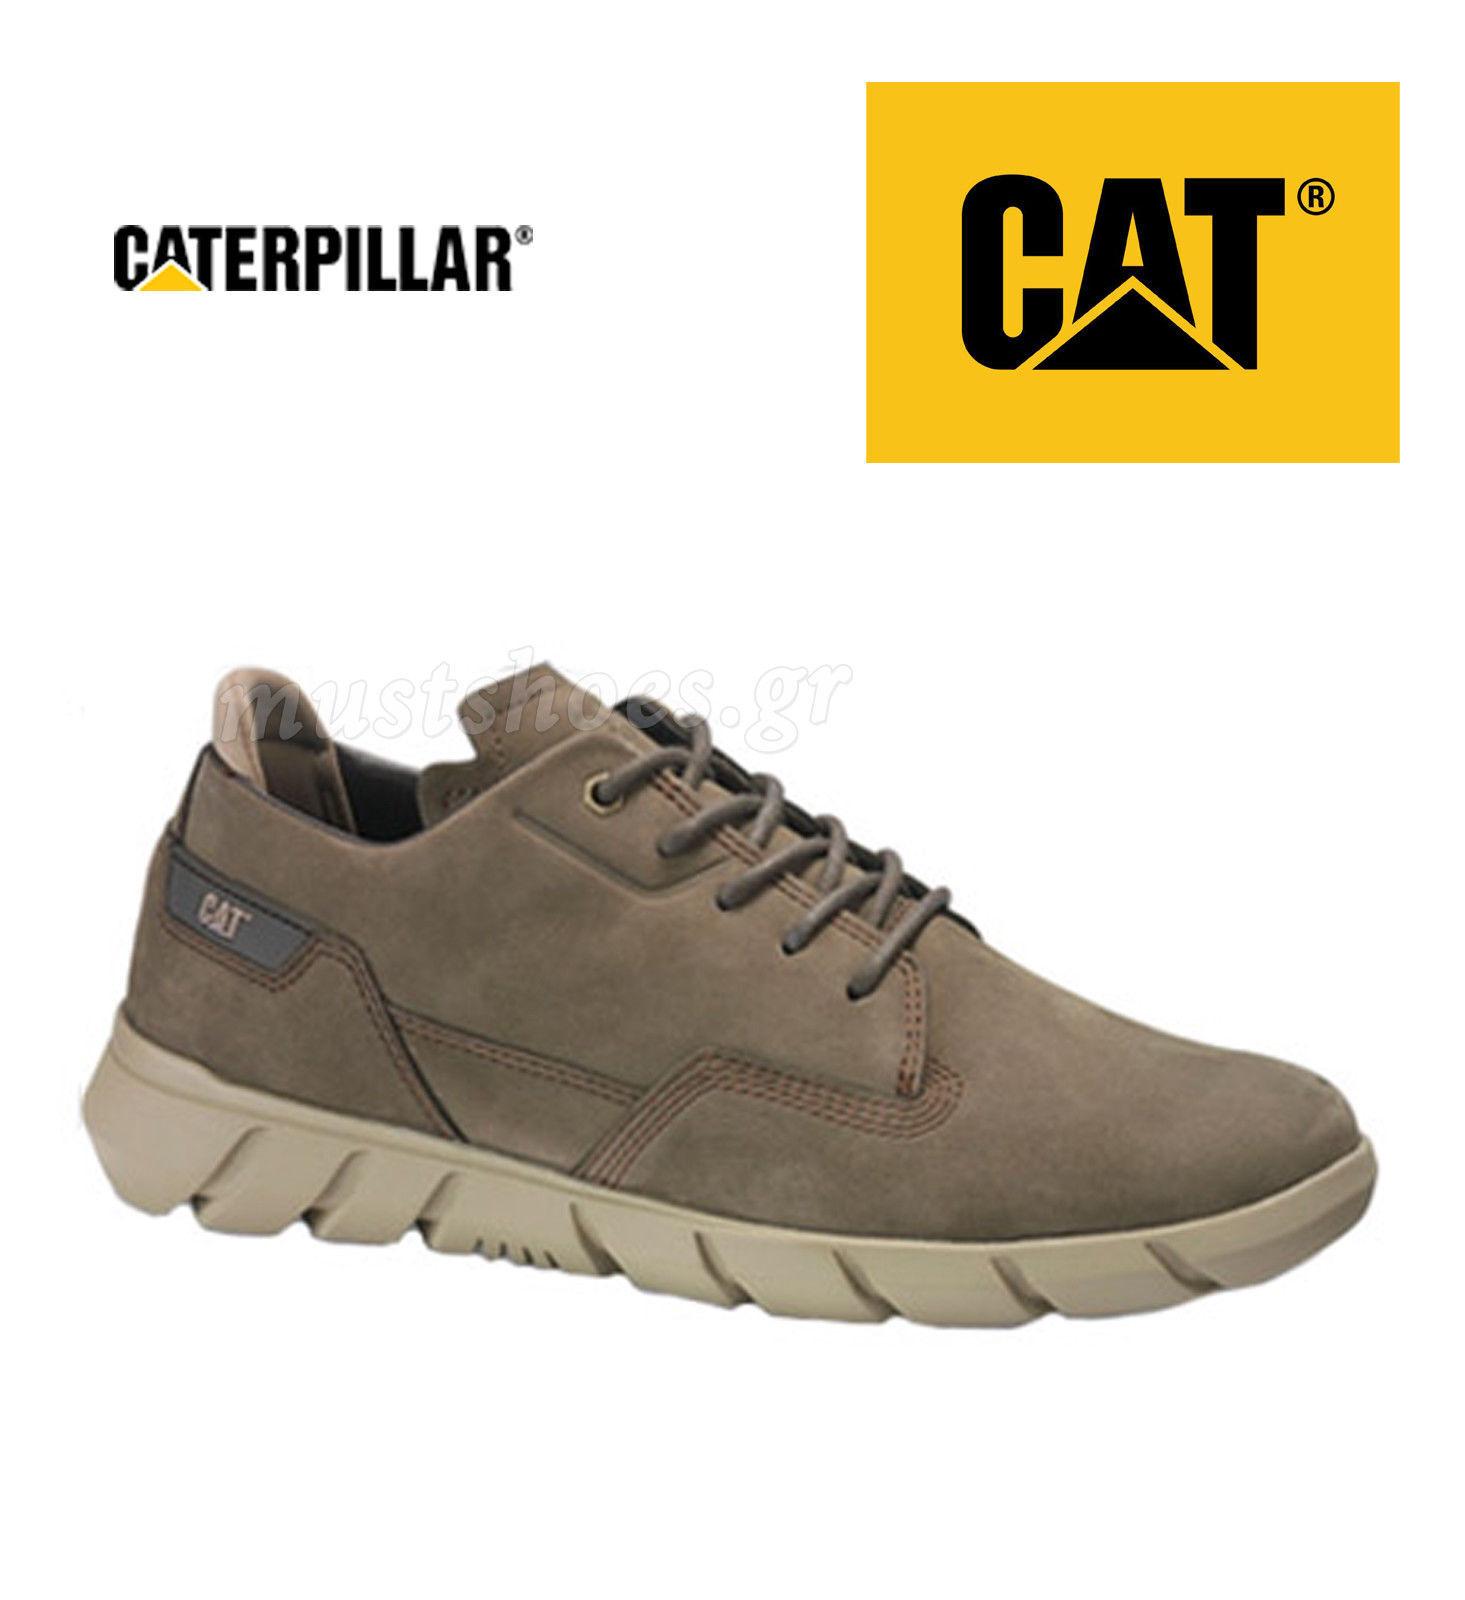 CATERPILLAR CAT 722919 CAMBERWELL OLIVE